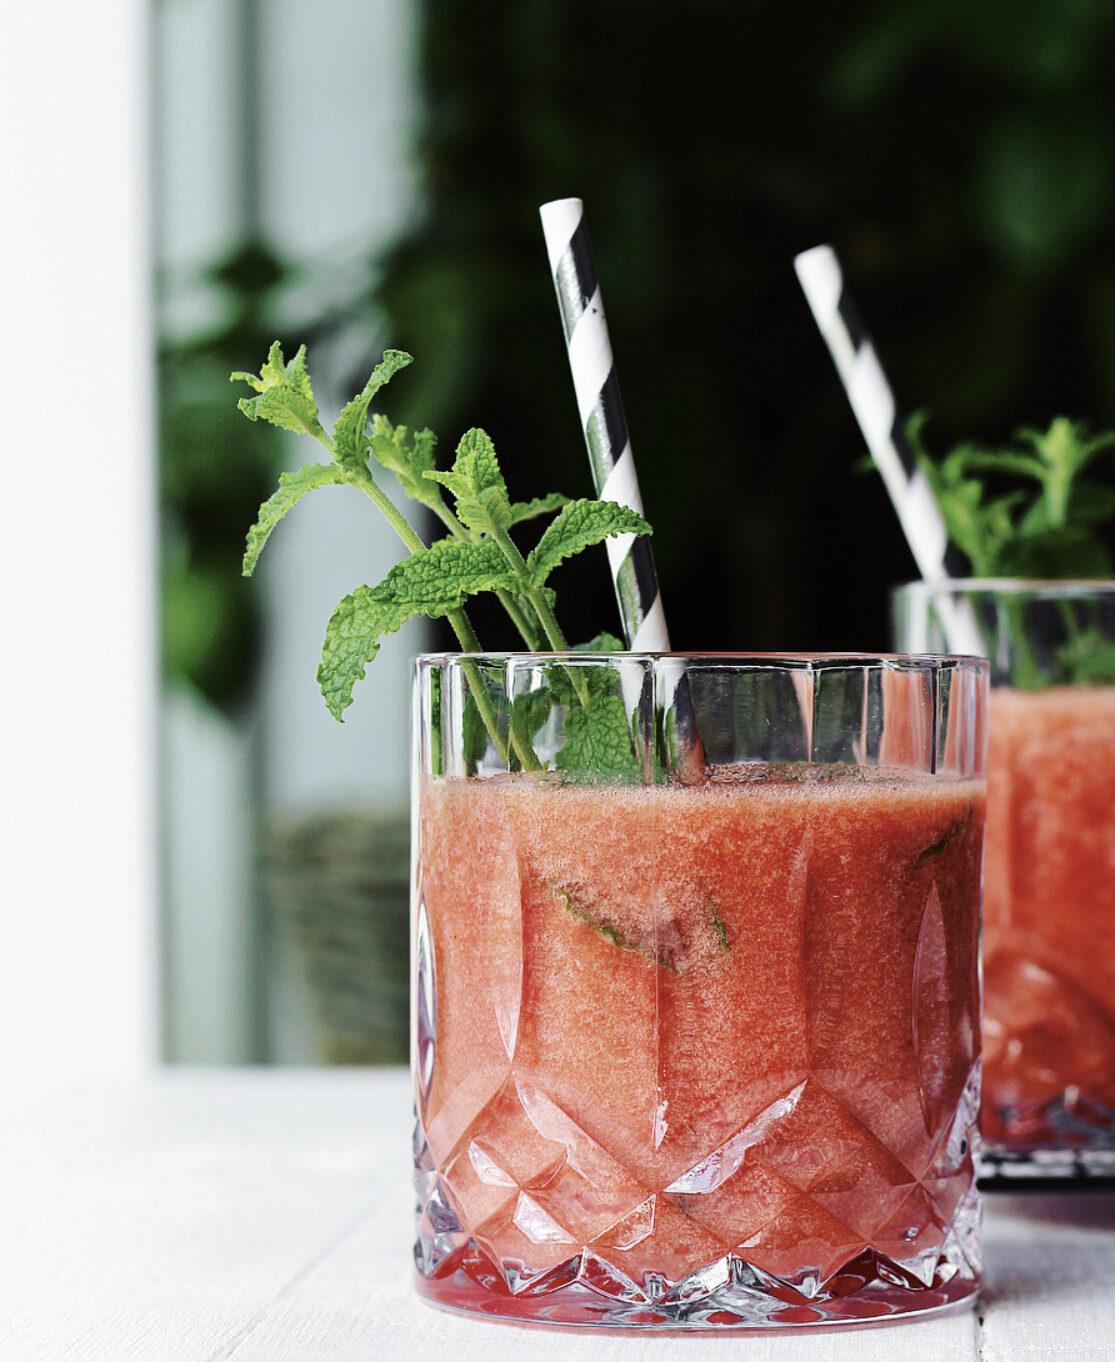 Vandmelon-jordbærdrik